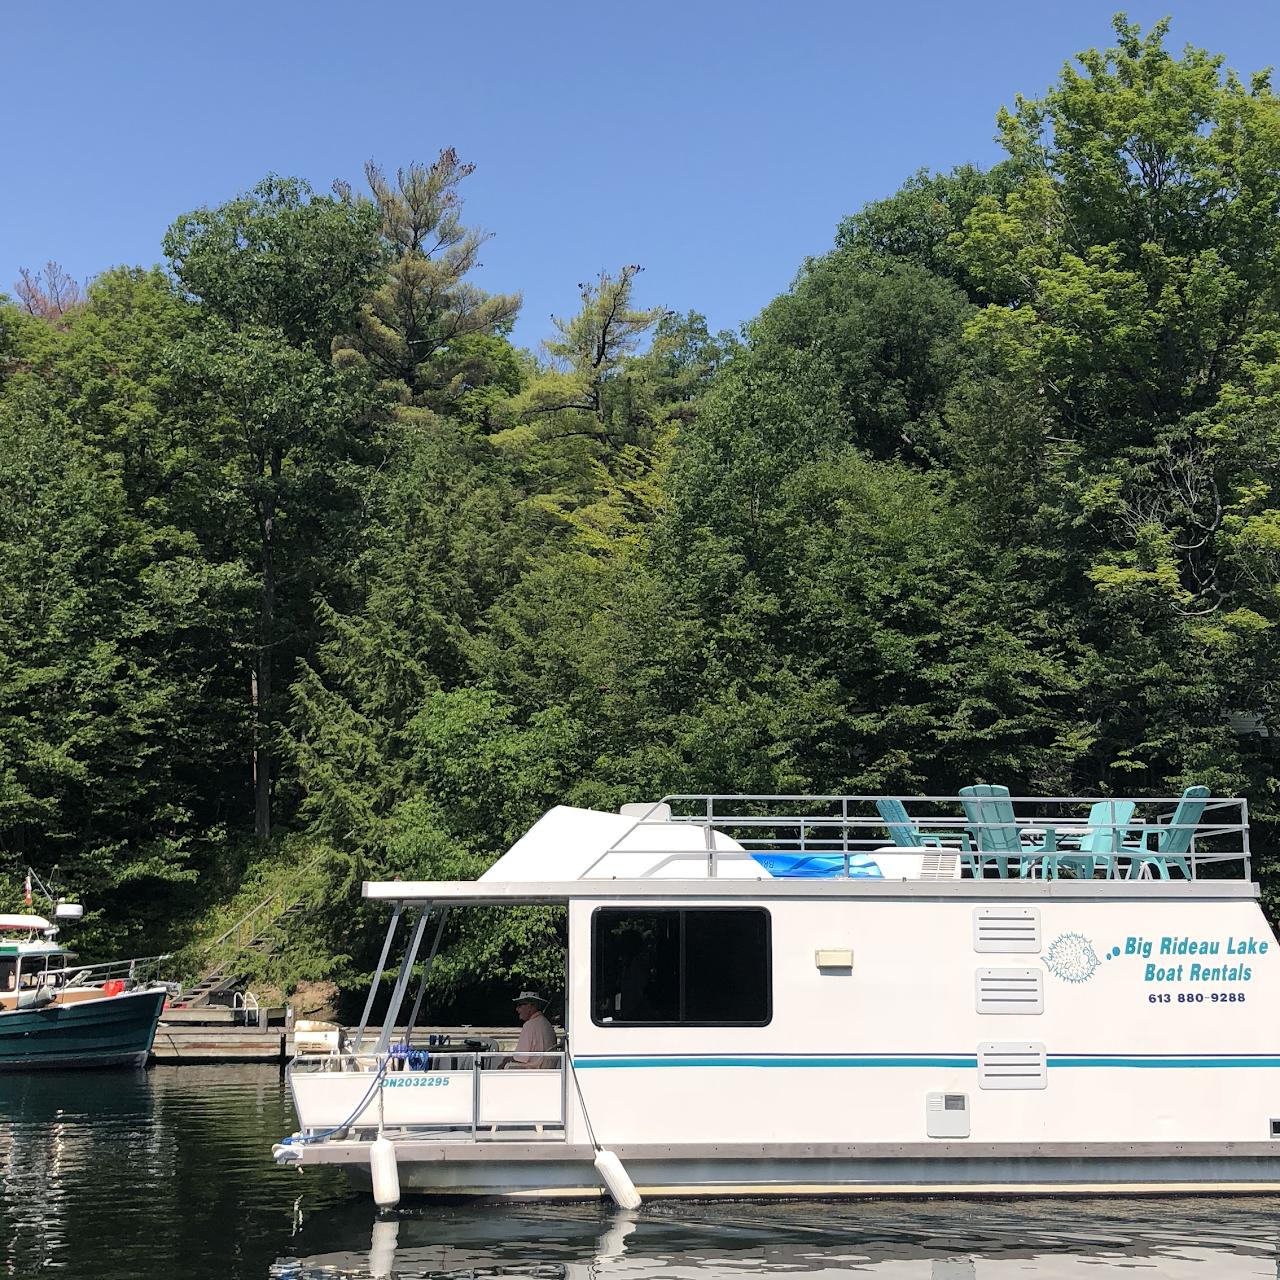 Rideau Lake Houseboat Rentals Houseboat Rental Service In